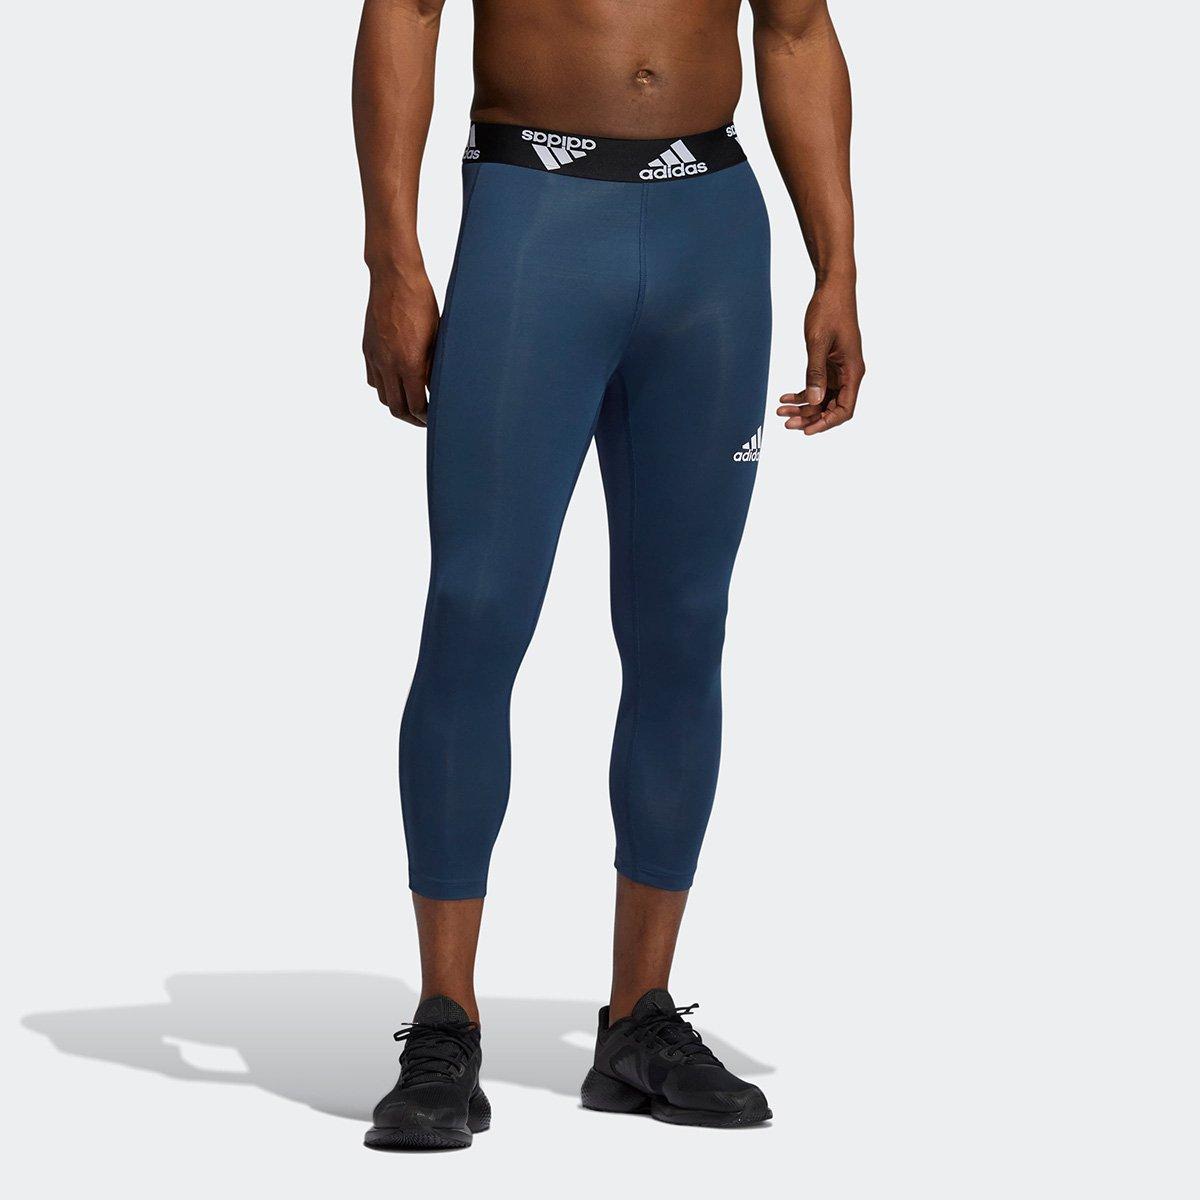 Bermuda Adidas Believe These 2.0 3 Listras Feminina